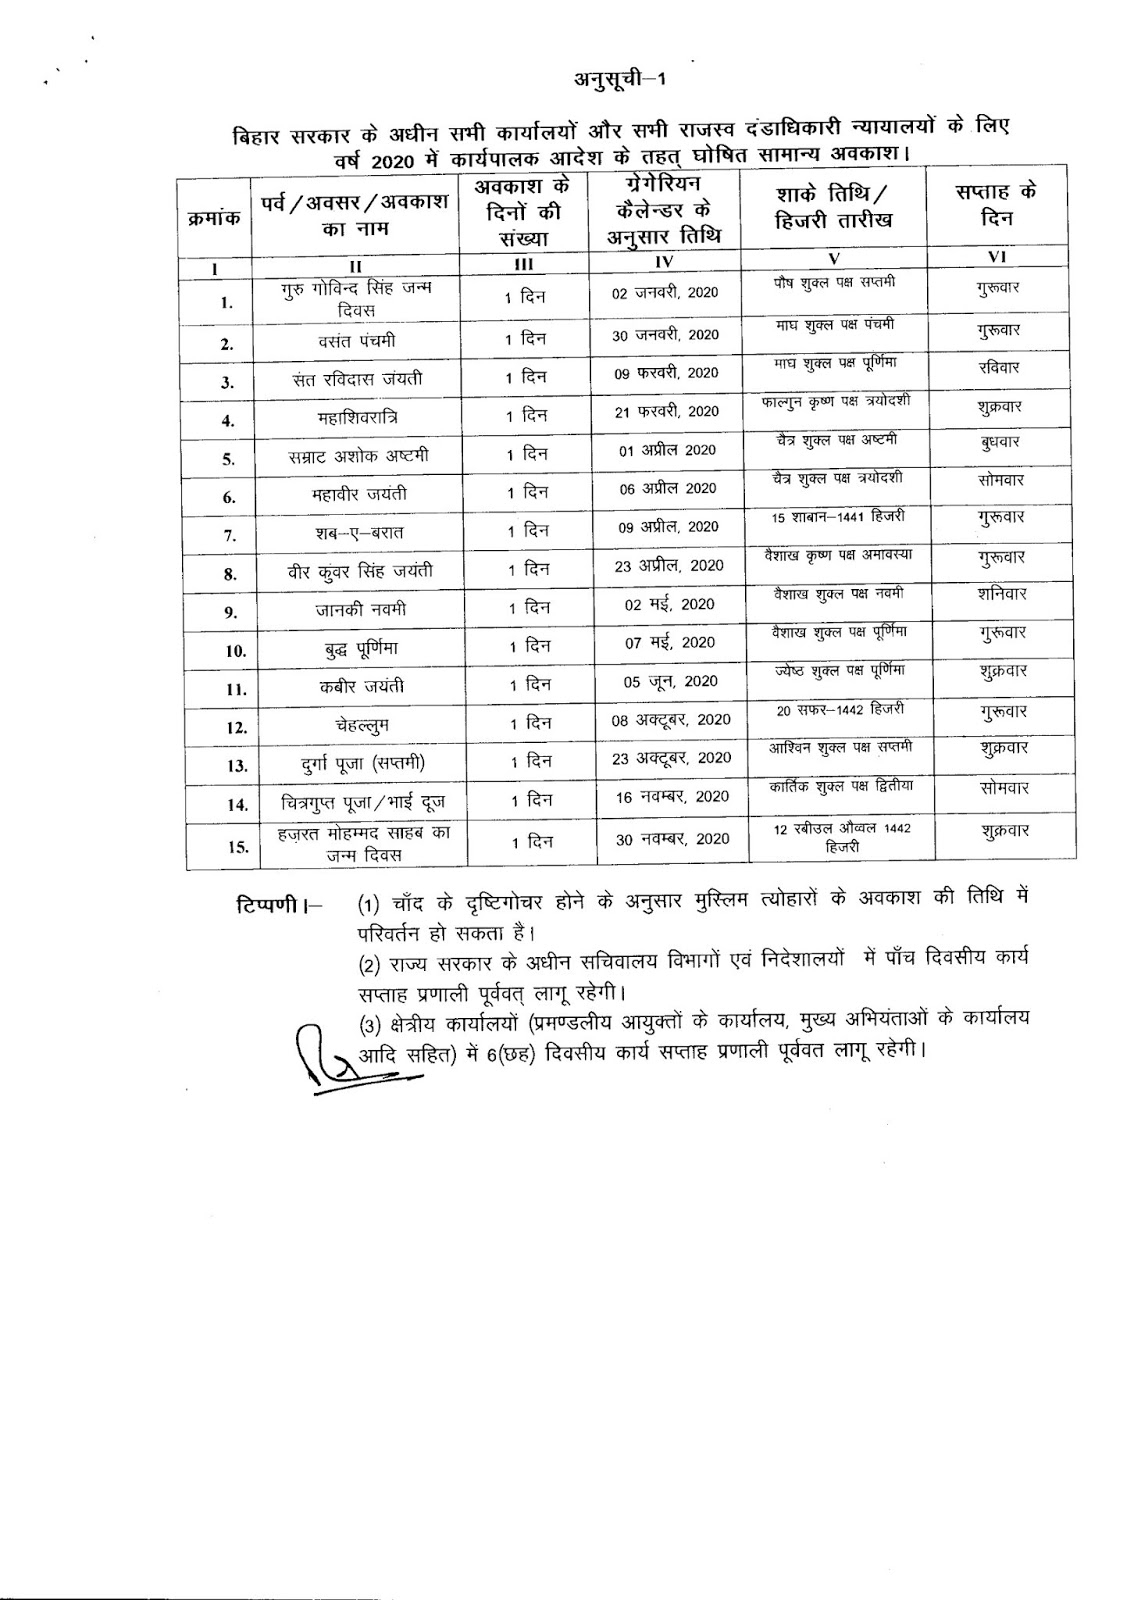 Bihar Government Calendar 2020 #educratsweb intended for Govt Of Bihar Calendar 2020